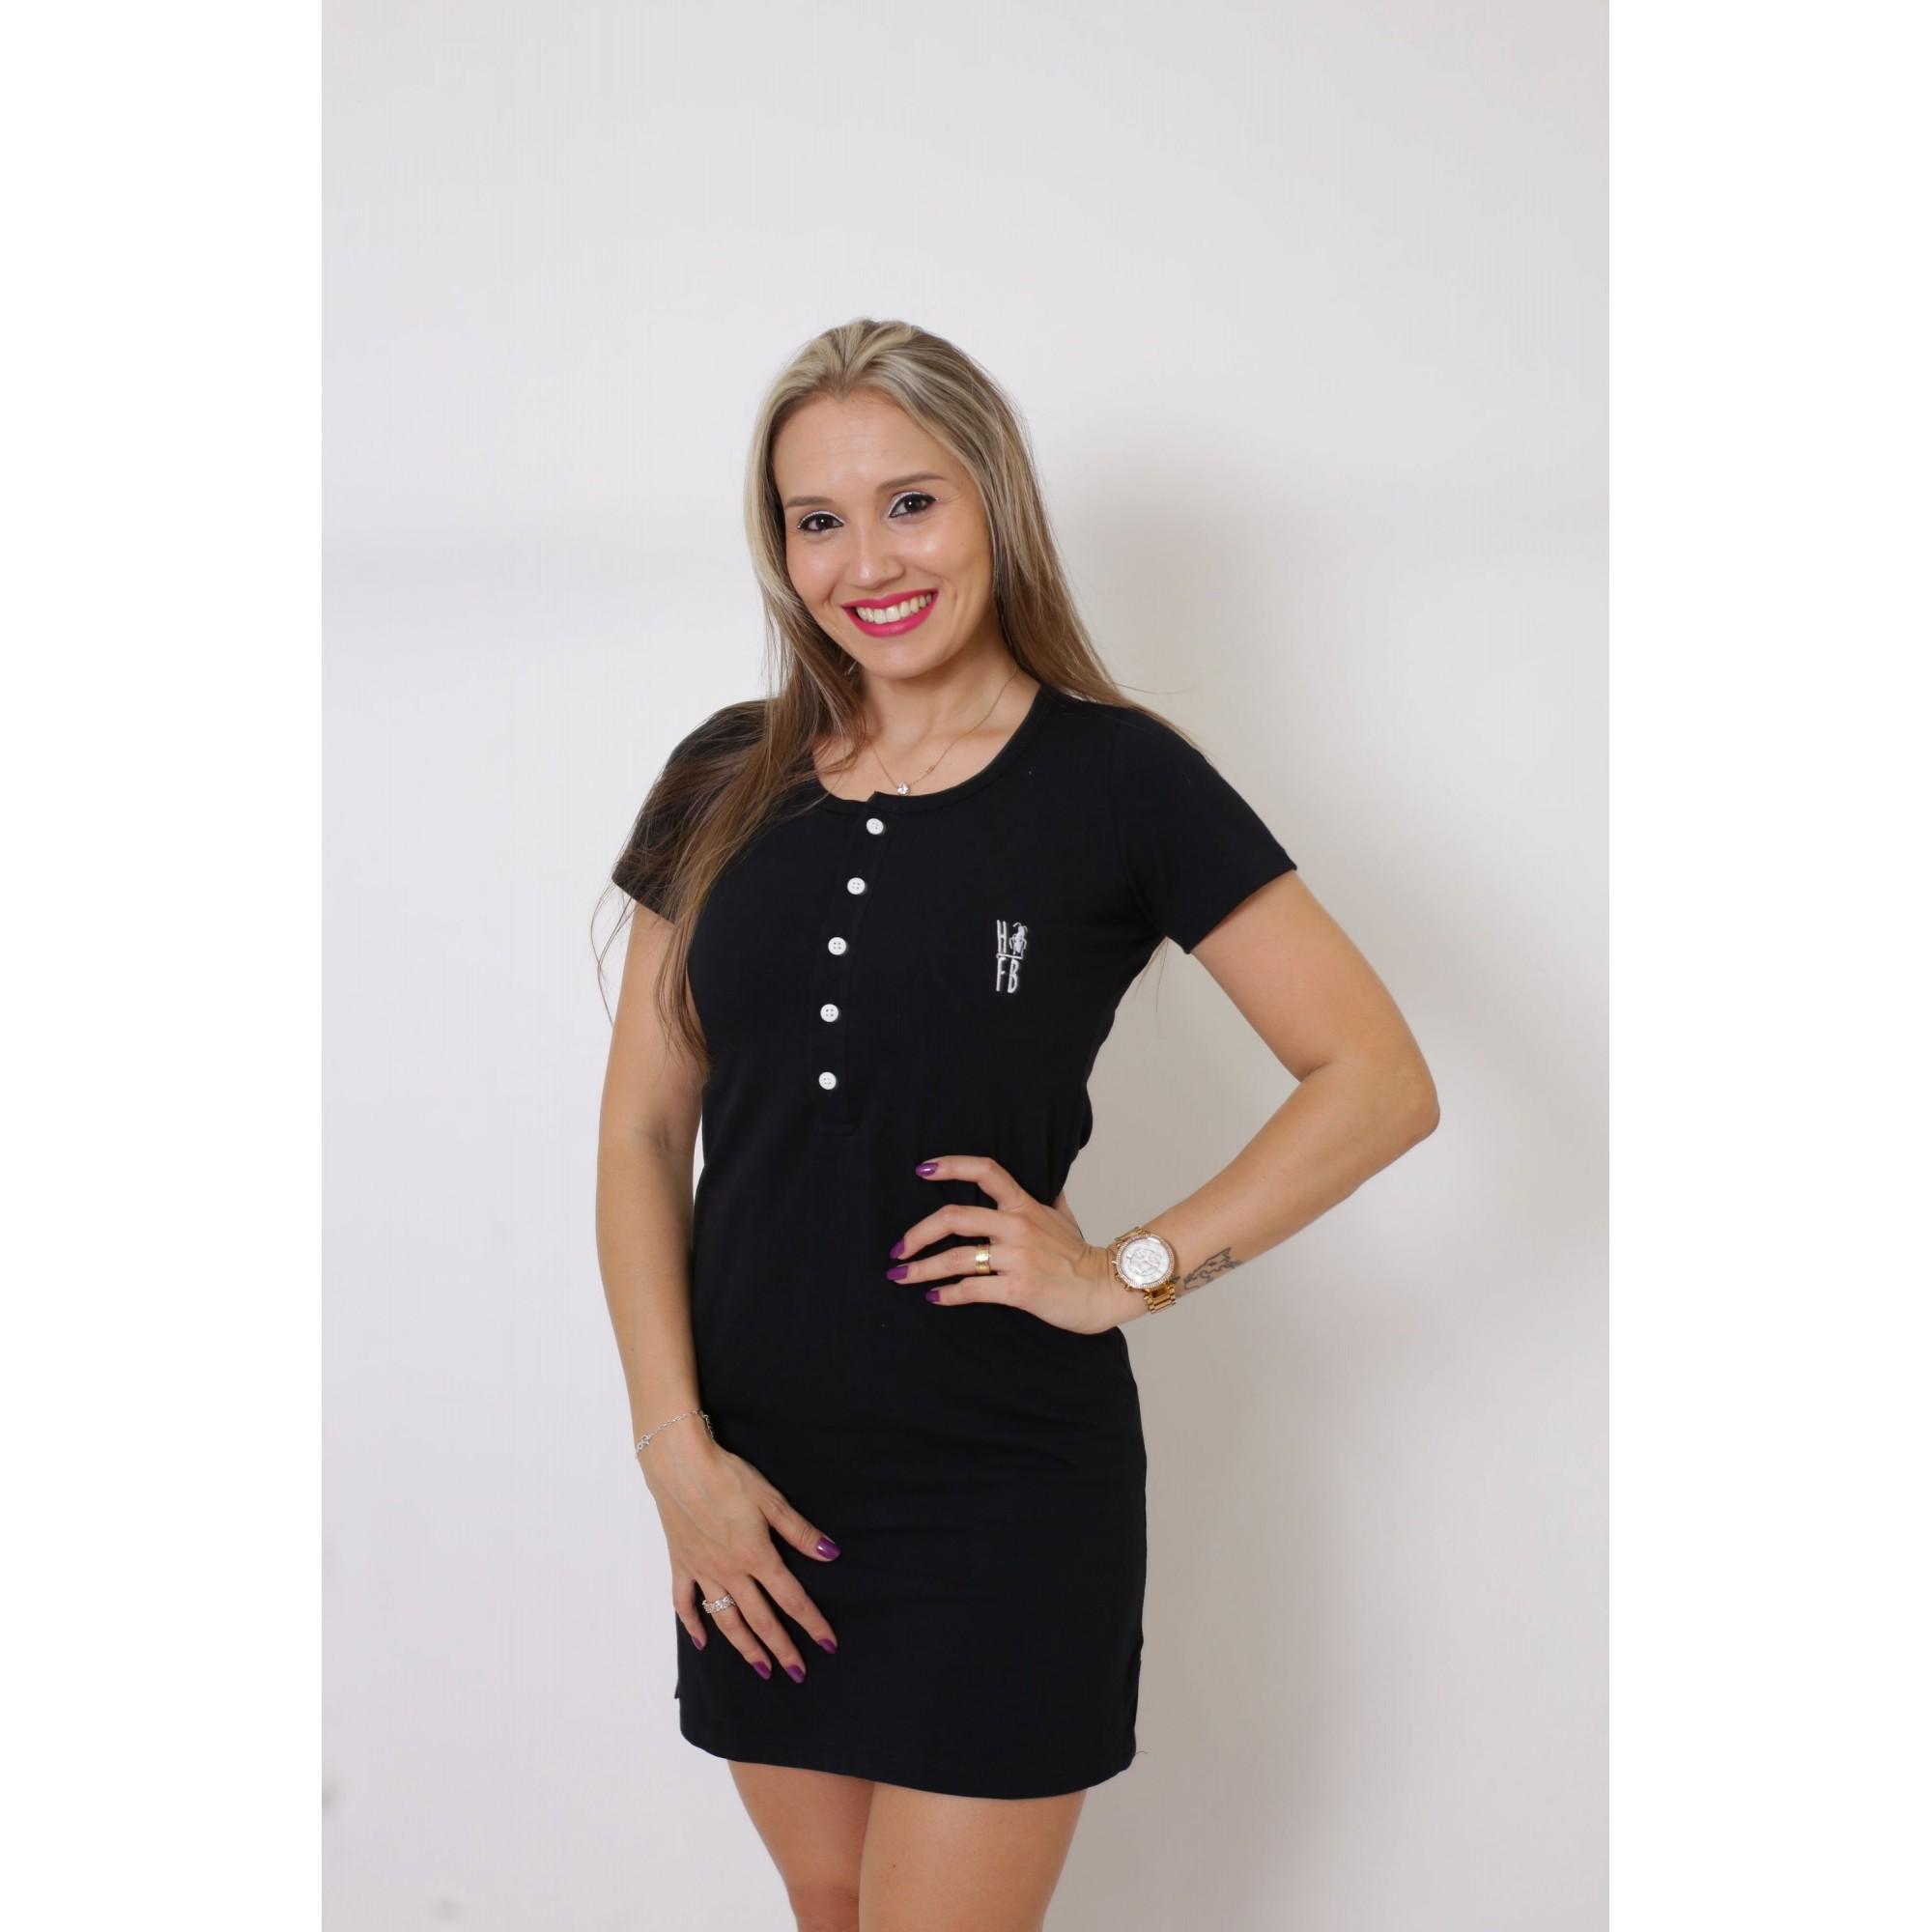 MÃE E FILHO > Kit Vestido + Body Infantil Unissex - Henley - Preto [Coleção Tal Mãe Tal Filho]  - Heitor Fashion Brazil